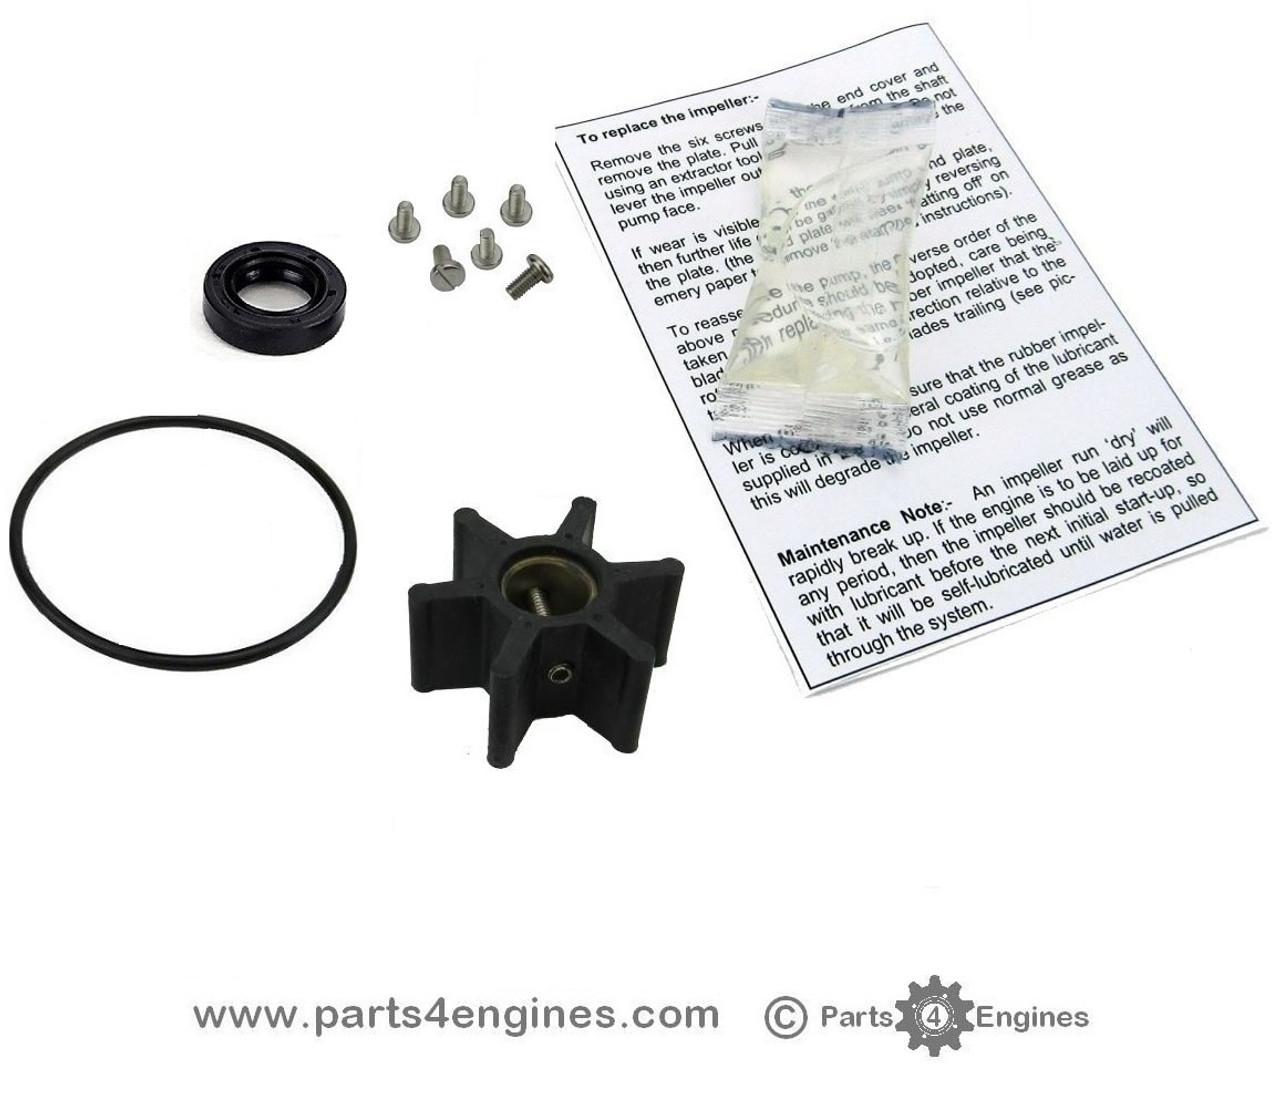 Yanmar 2GM20YEU & 3GM30YEU Raw water pump service kit - parts4engines.com